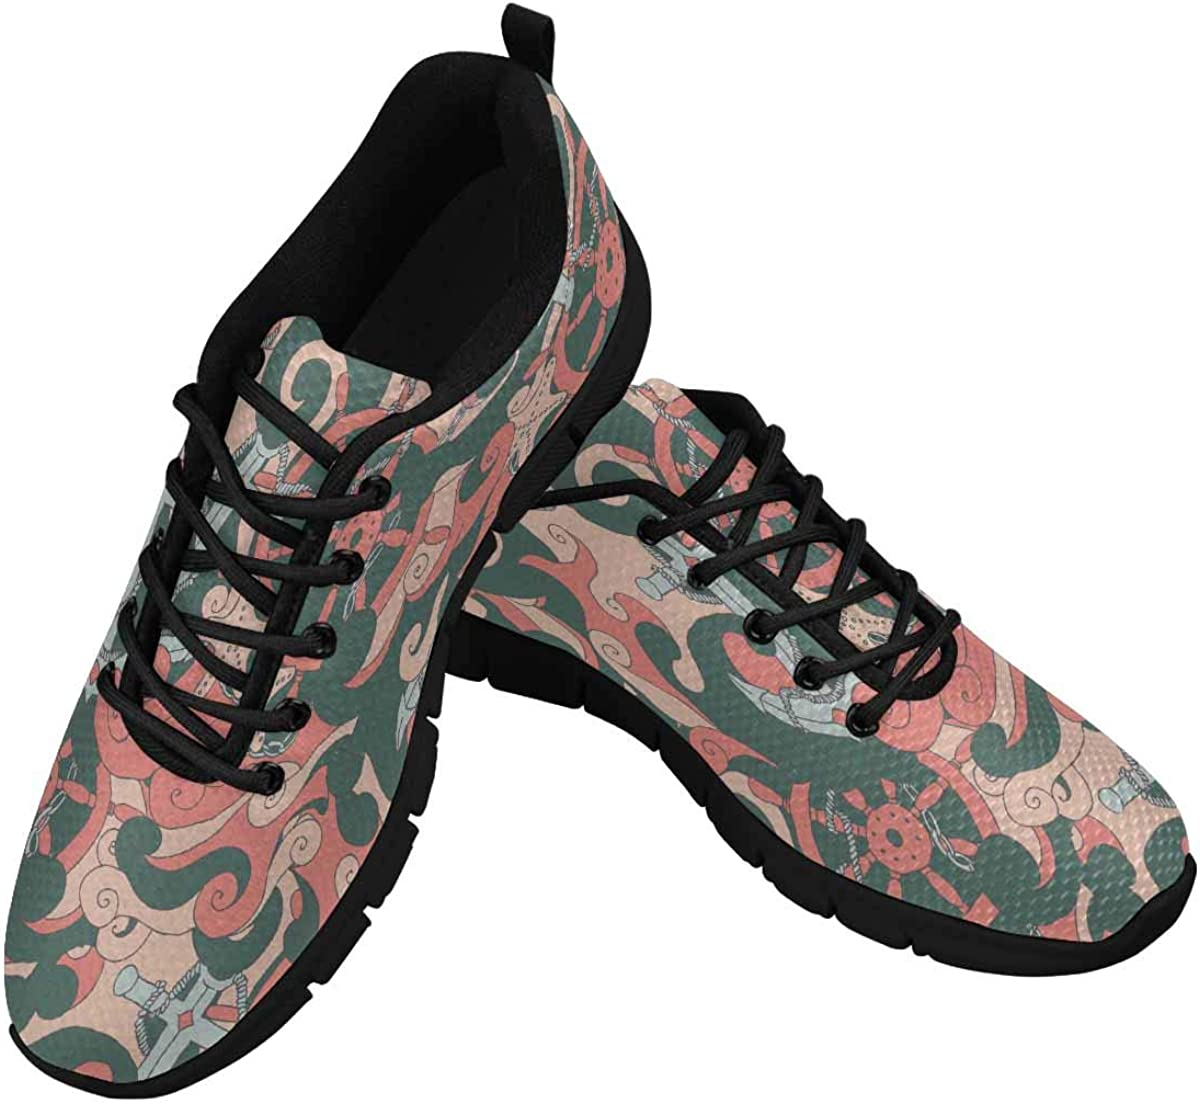 INTERESTPRINT Steering Wheel Anchor Lightweight Mesh Breathable Sneakers for Women